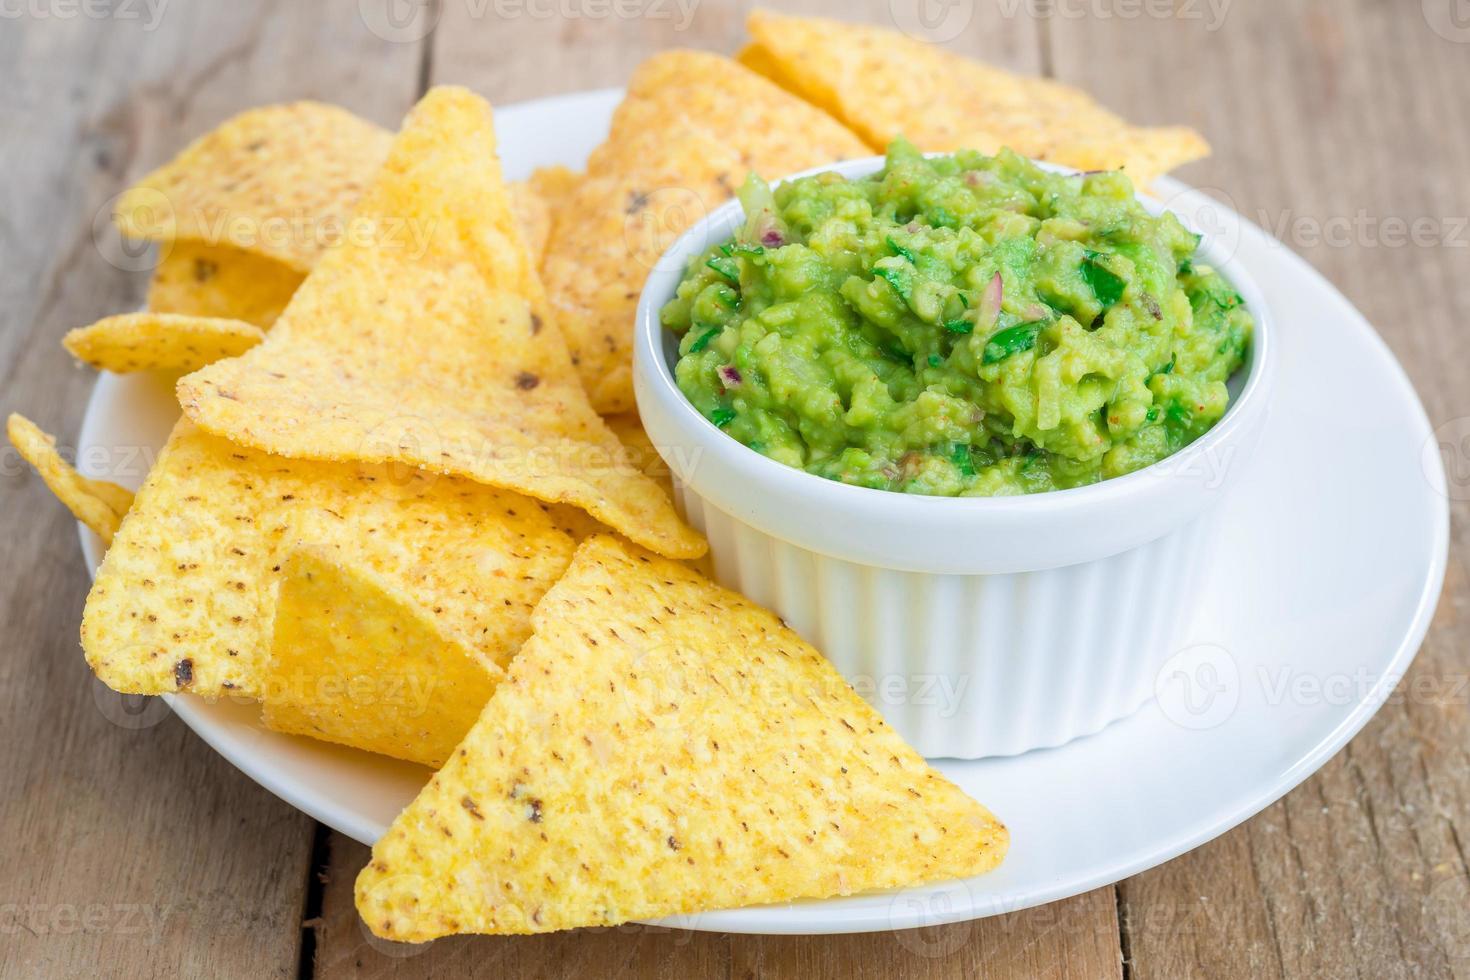 beker met dikke guacamole geserveerd met nacho's foto